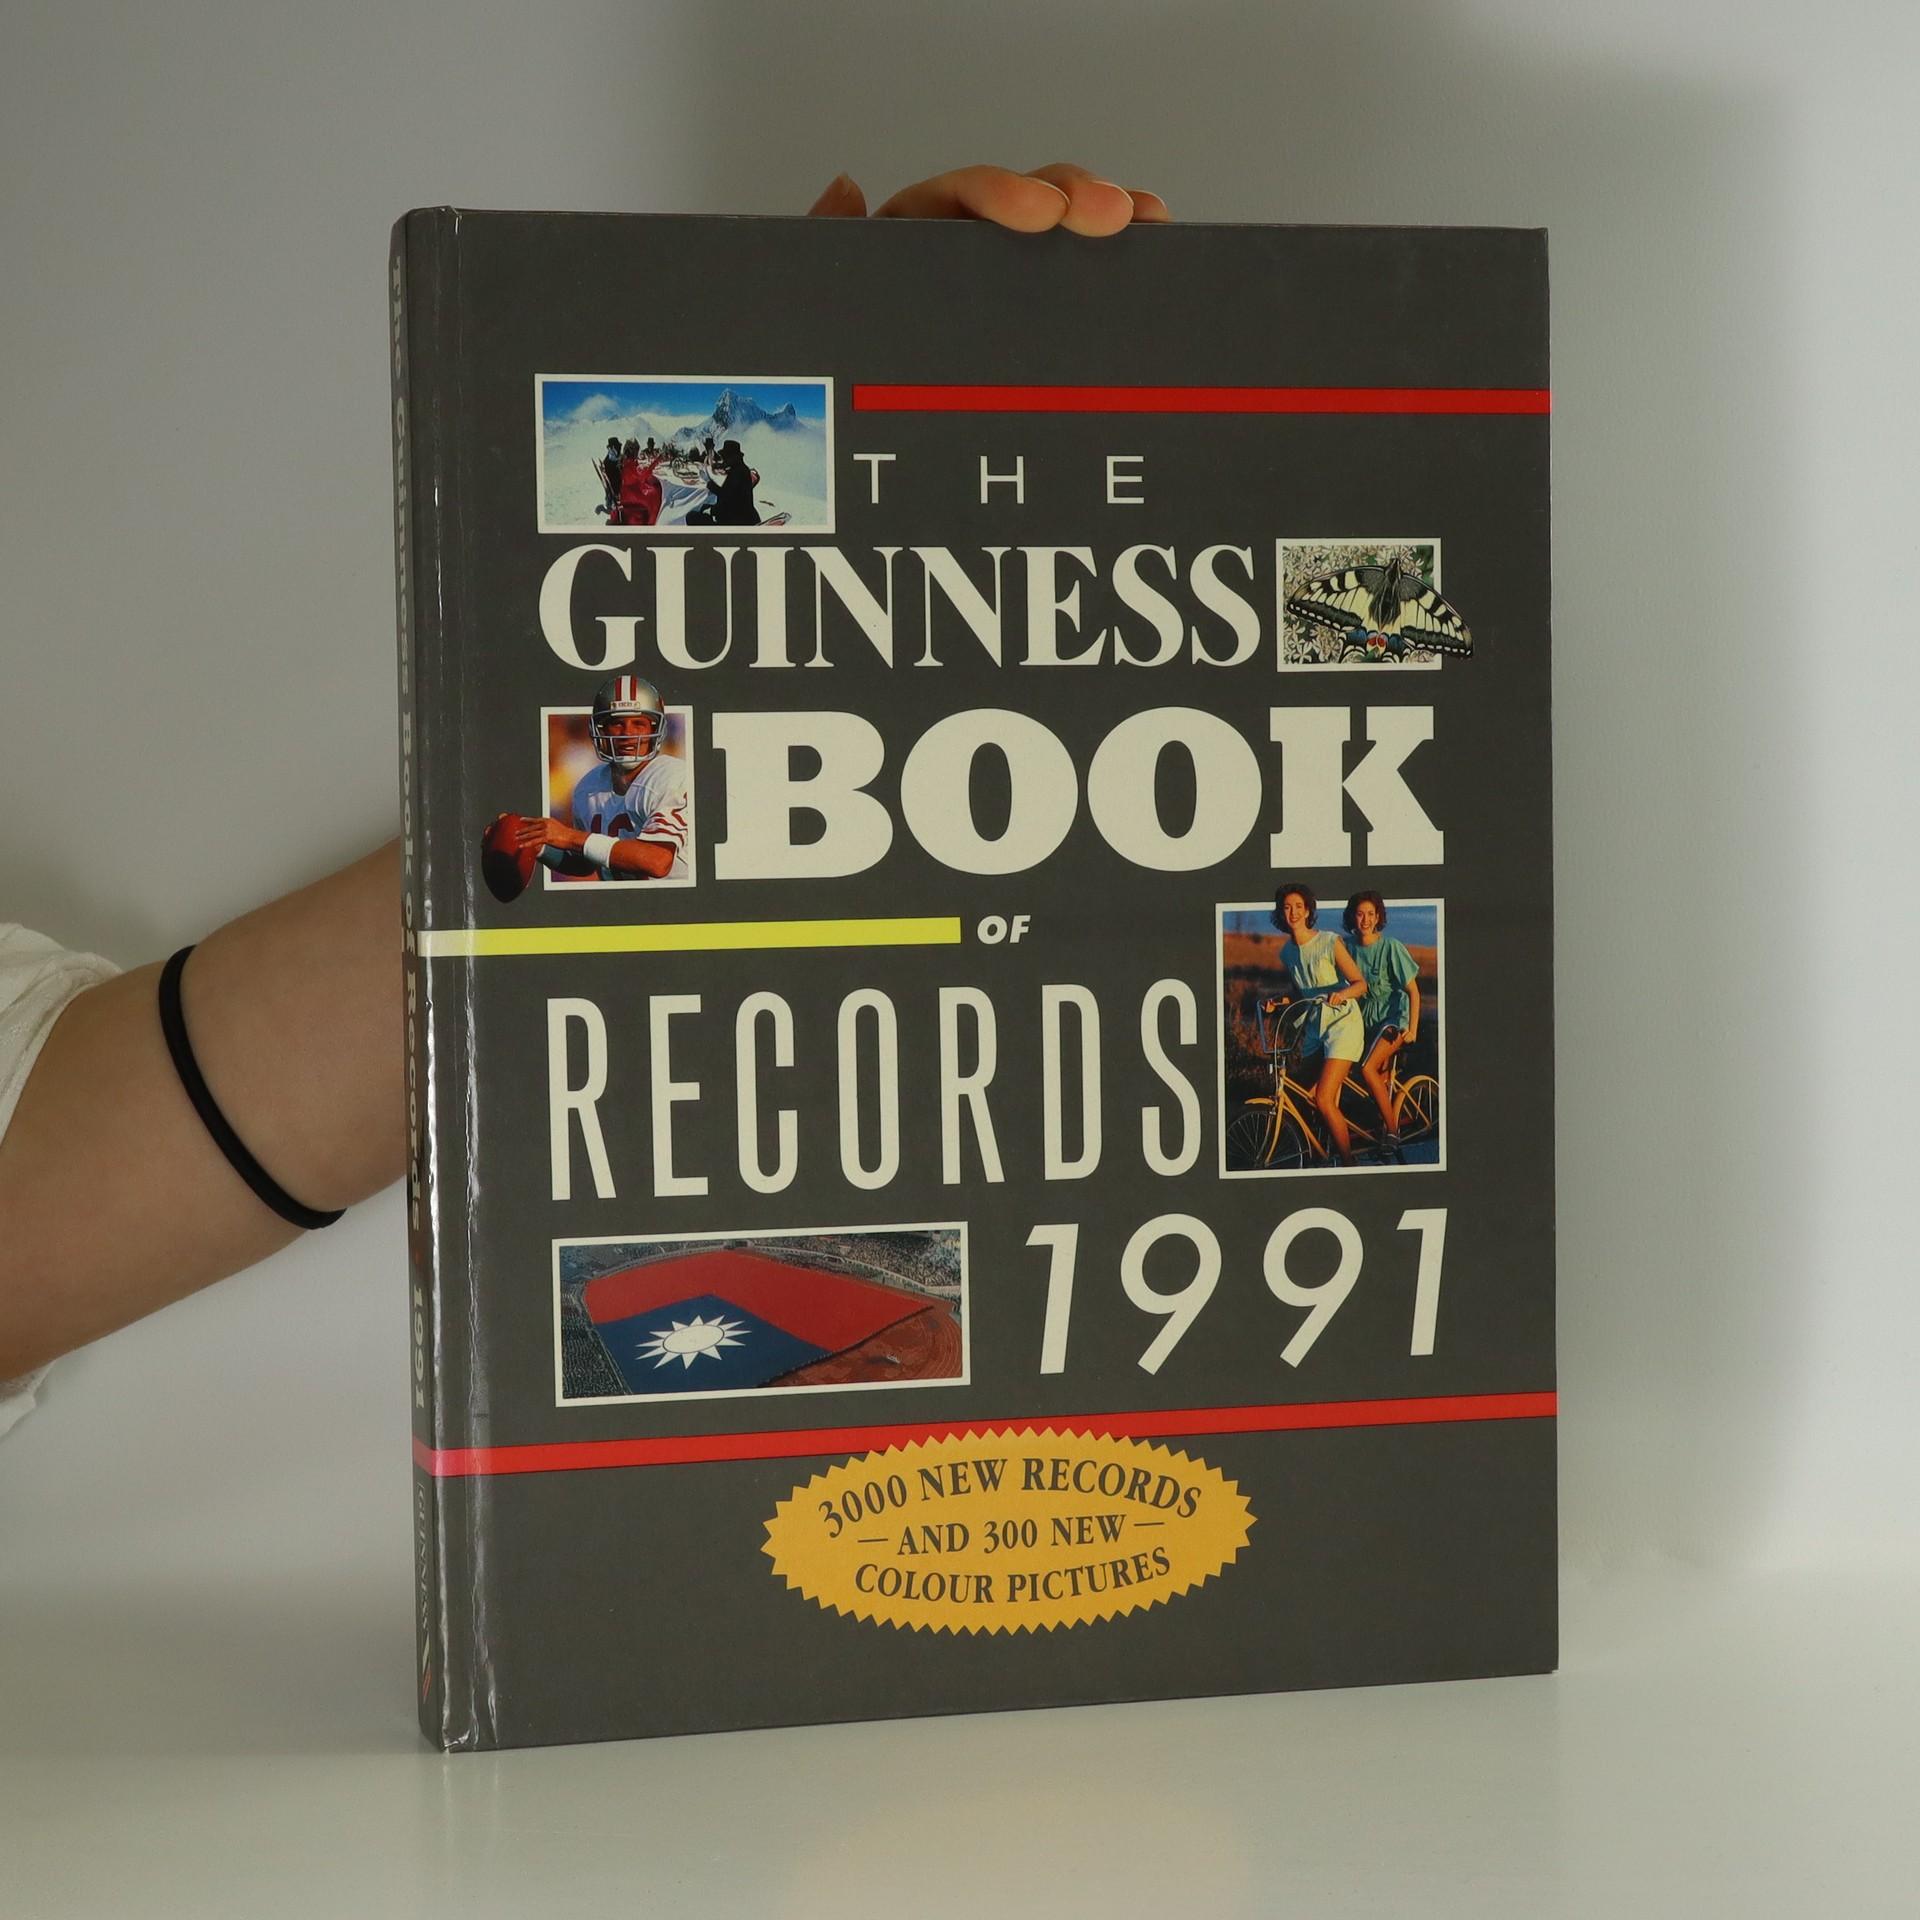 antikvární kniha The Guinness Book of records 1991, neuveden